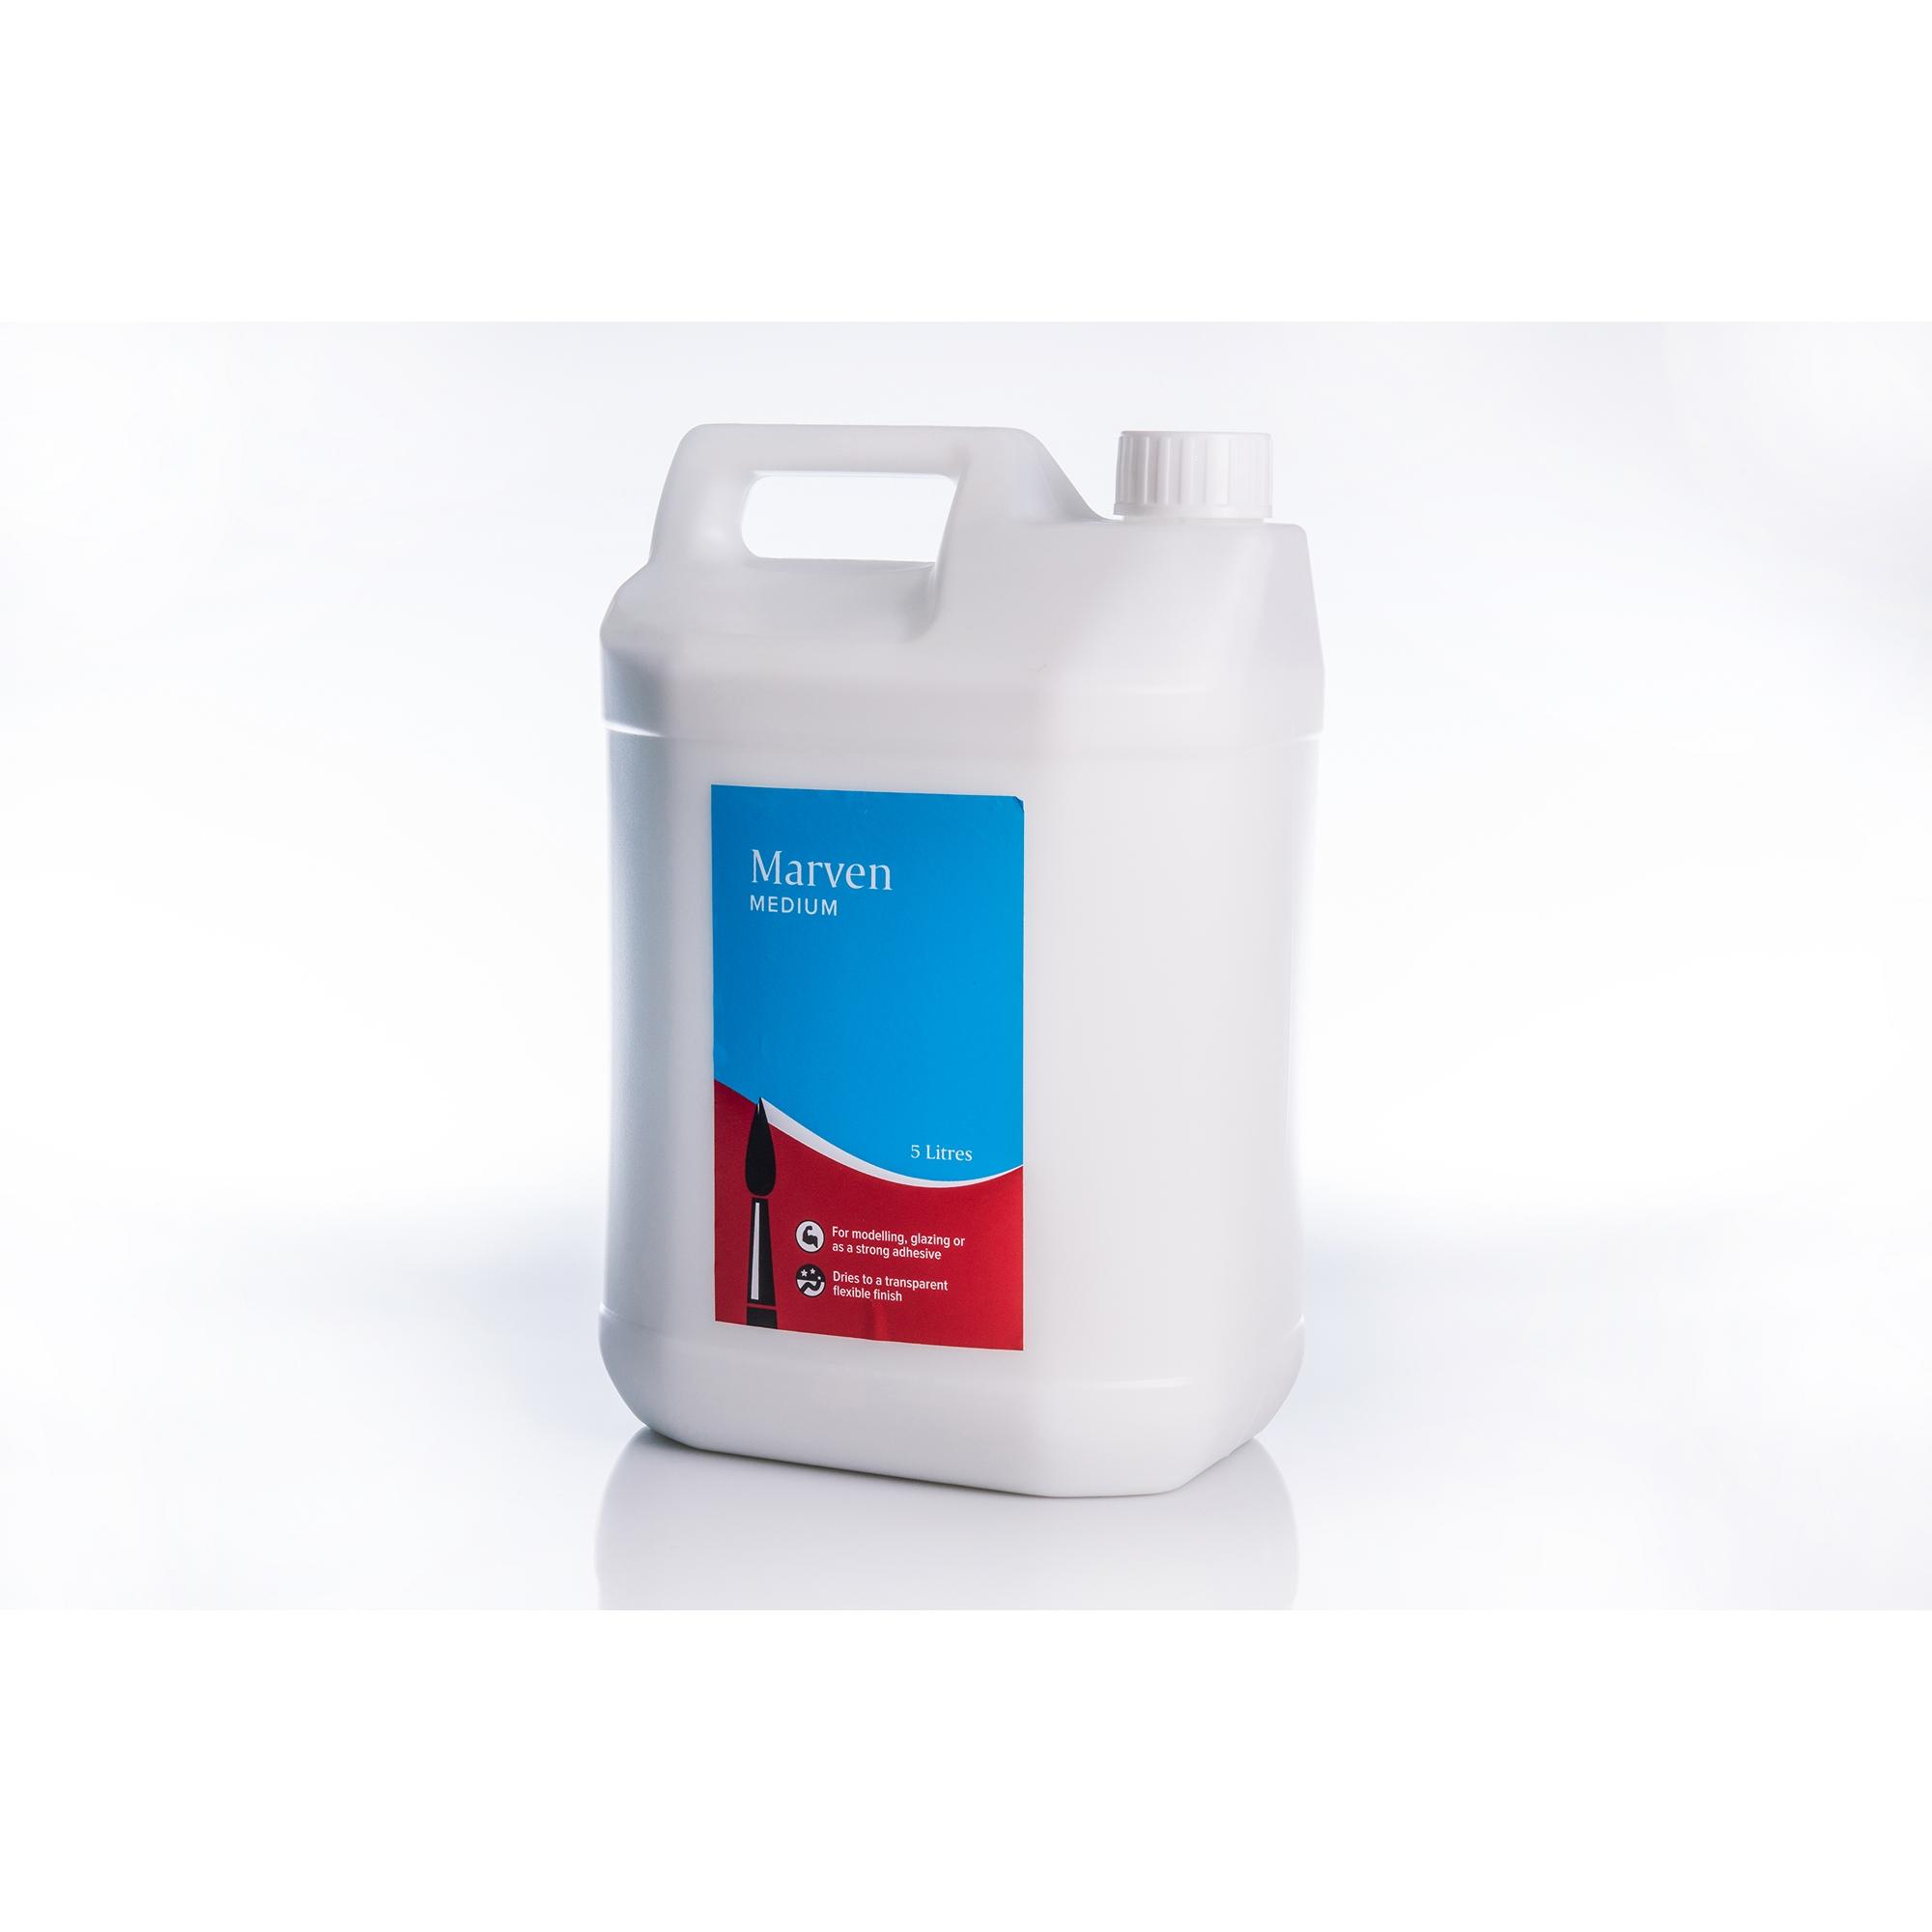 Marven Medium PVA Glue 5L